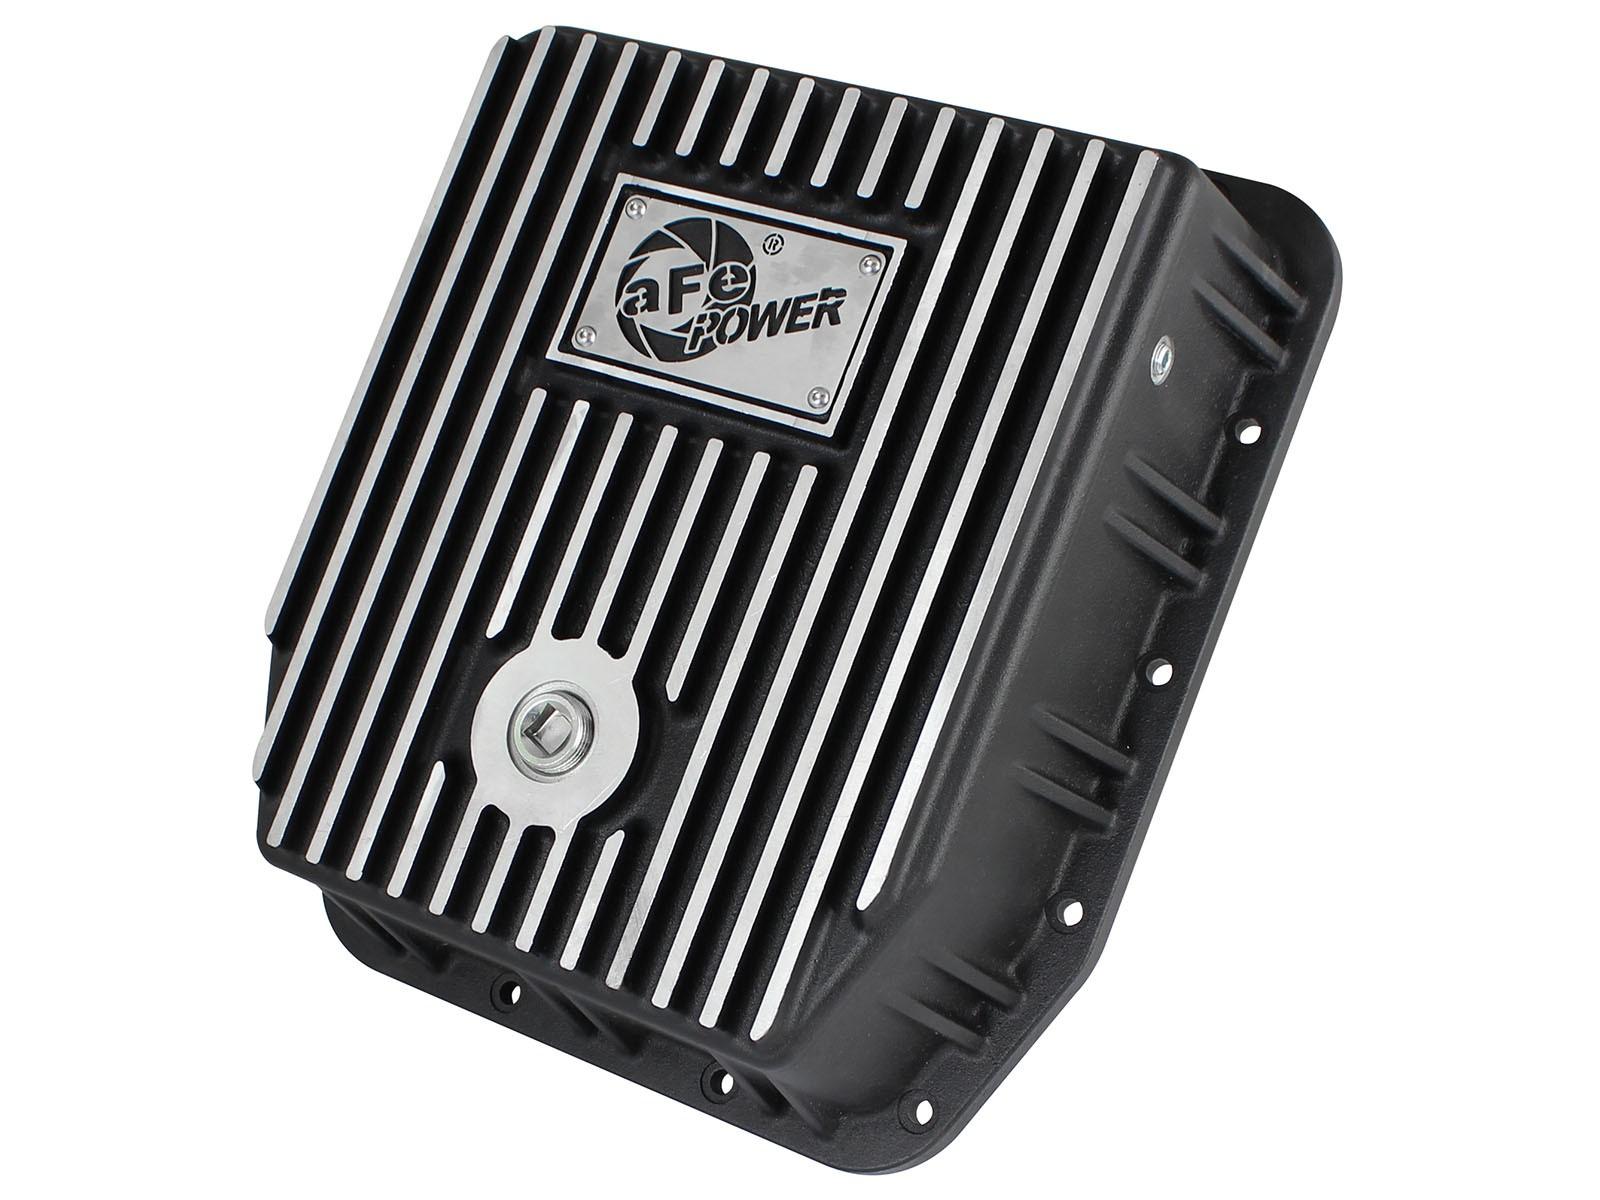 aFe POWER 46-70222 Transmission Pan, Machined Fins